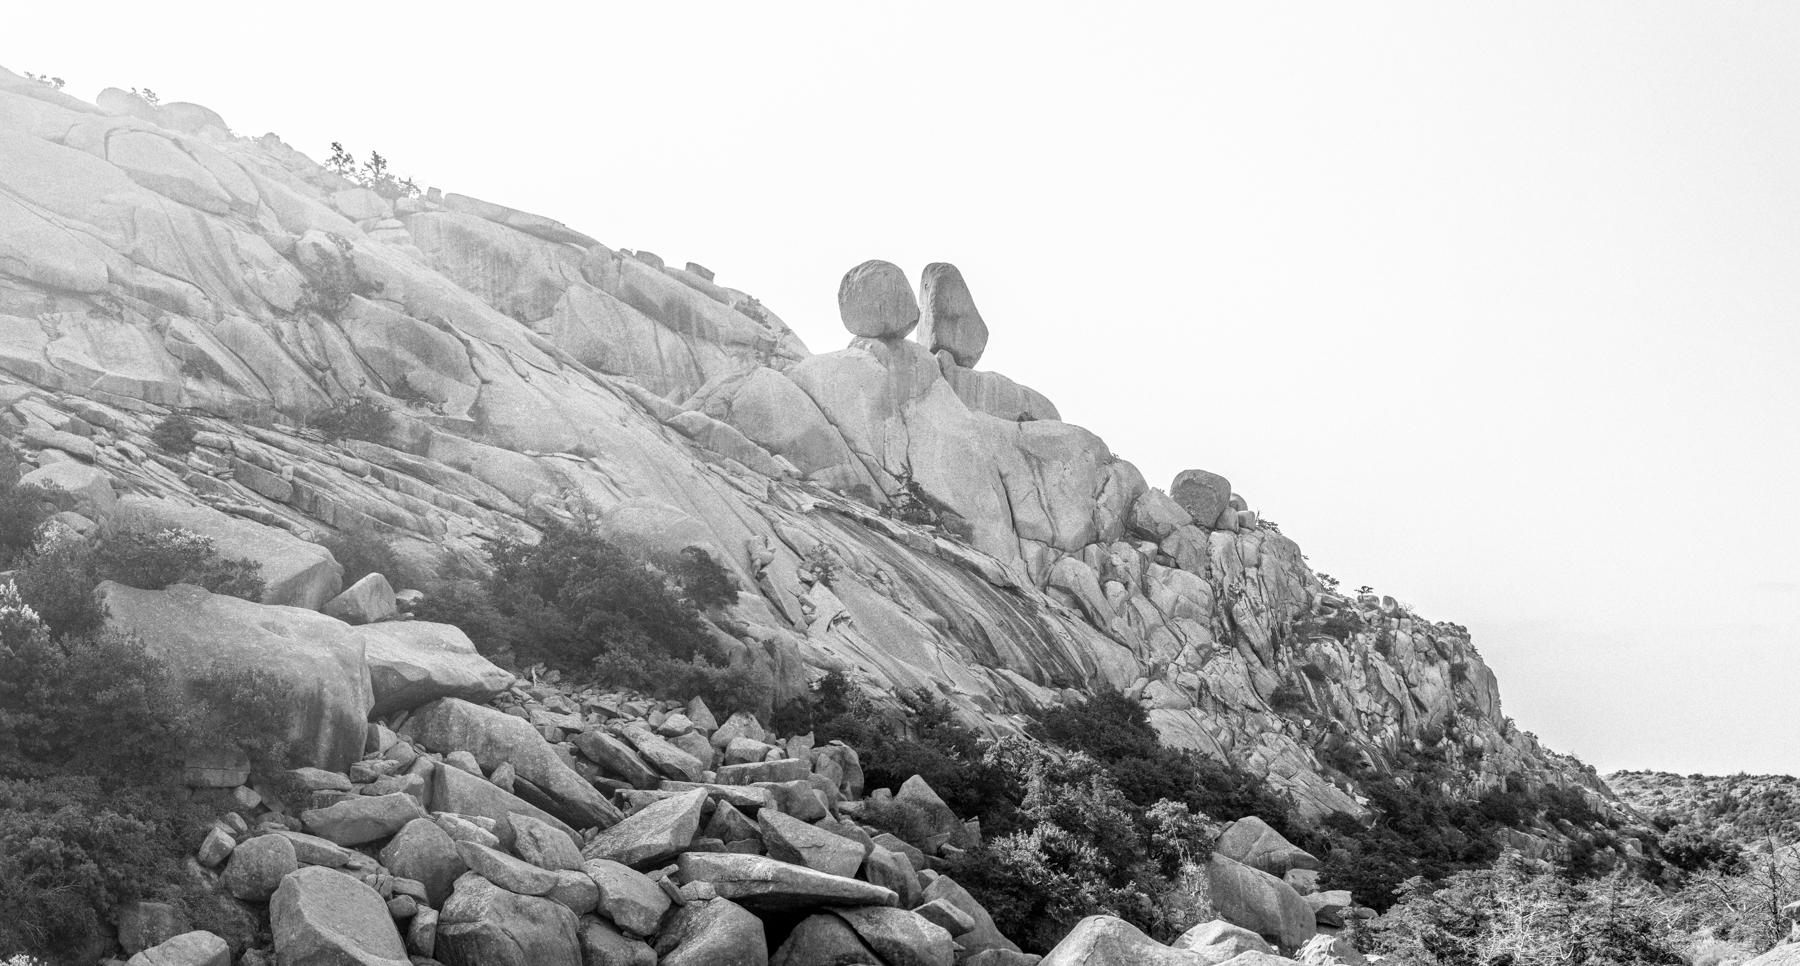 2017-08-05 Glass Mountain Peak B (12 of 20).jpg